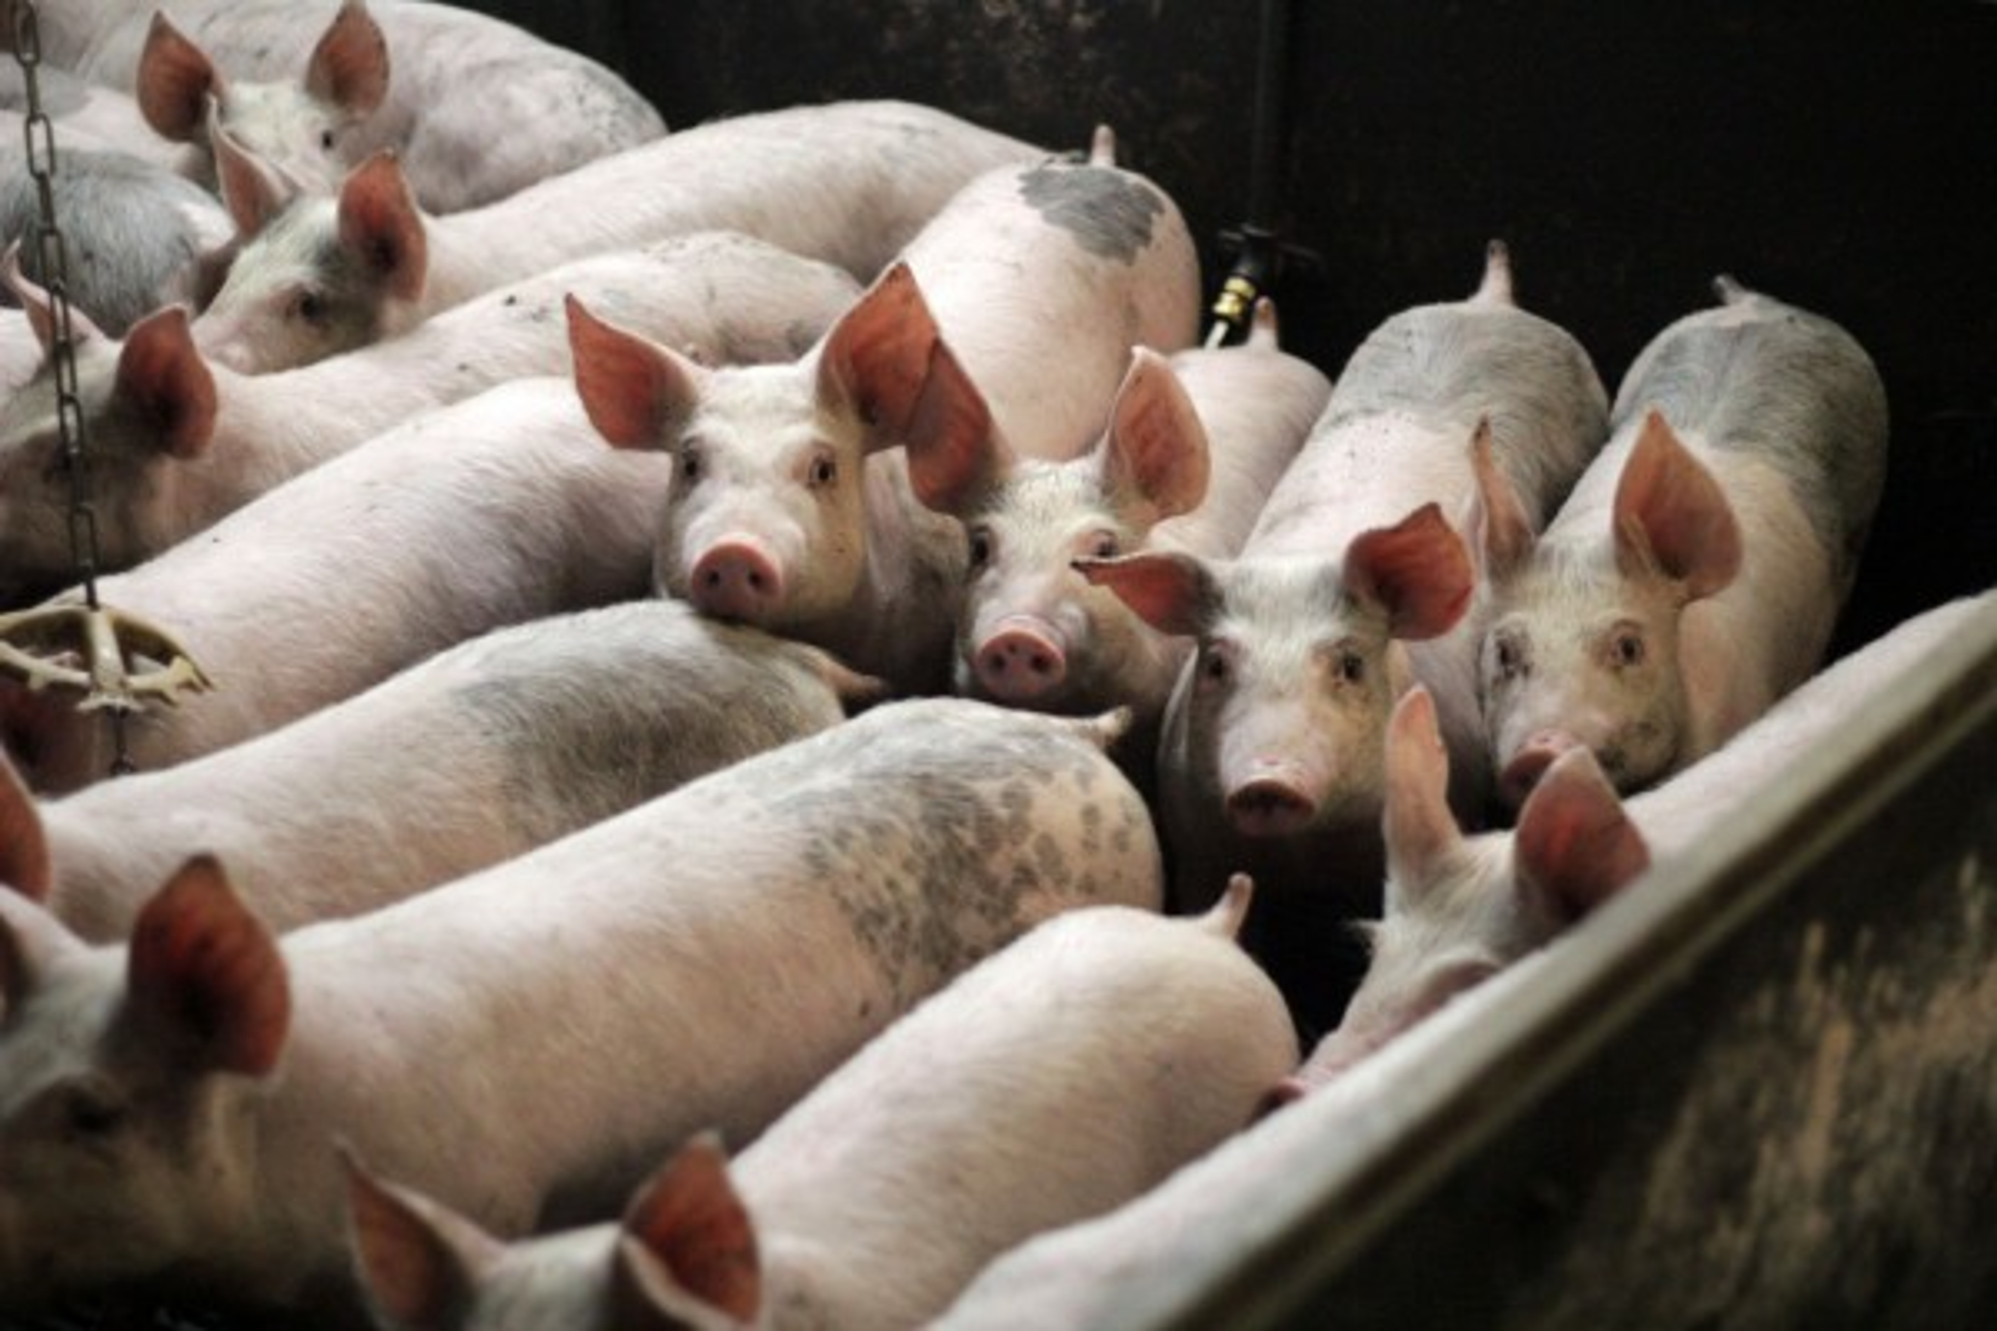 Pigs on a low-welfare farm.